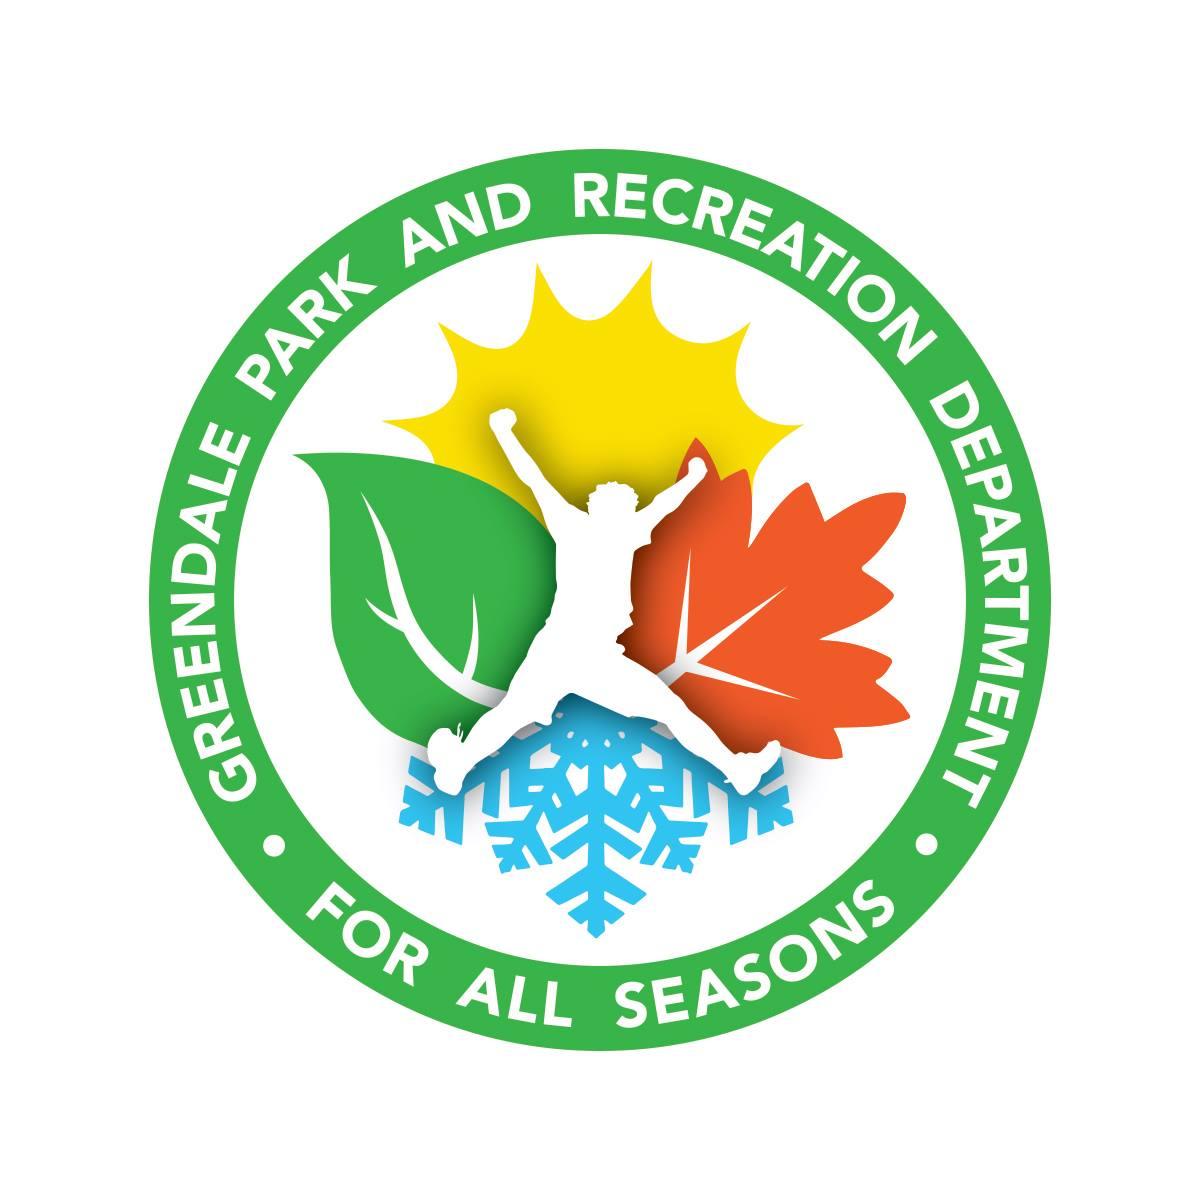 Greendale Park Recreation